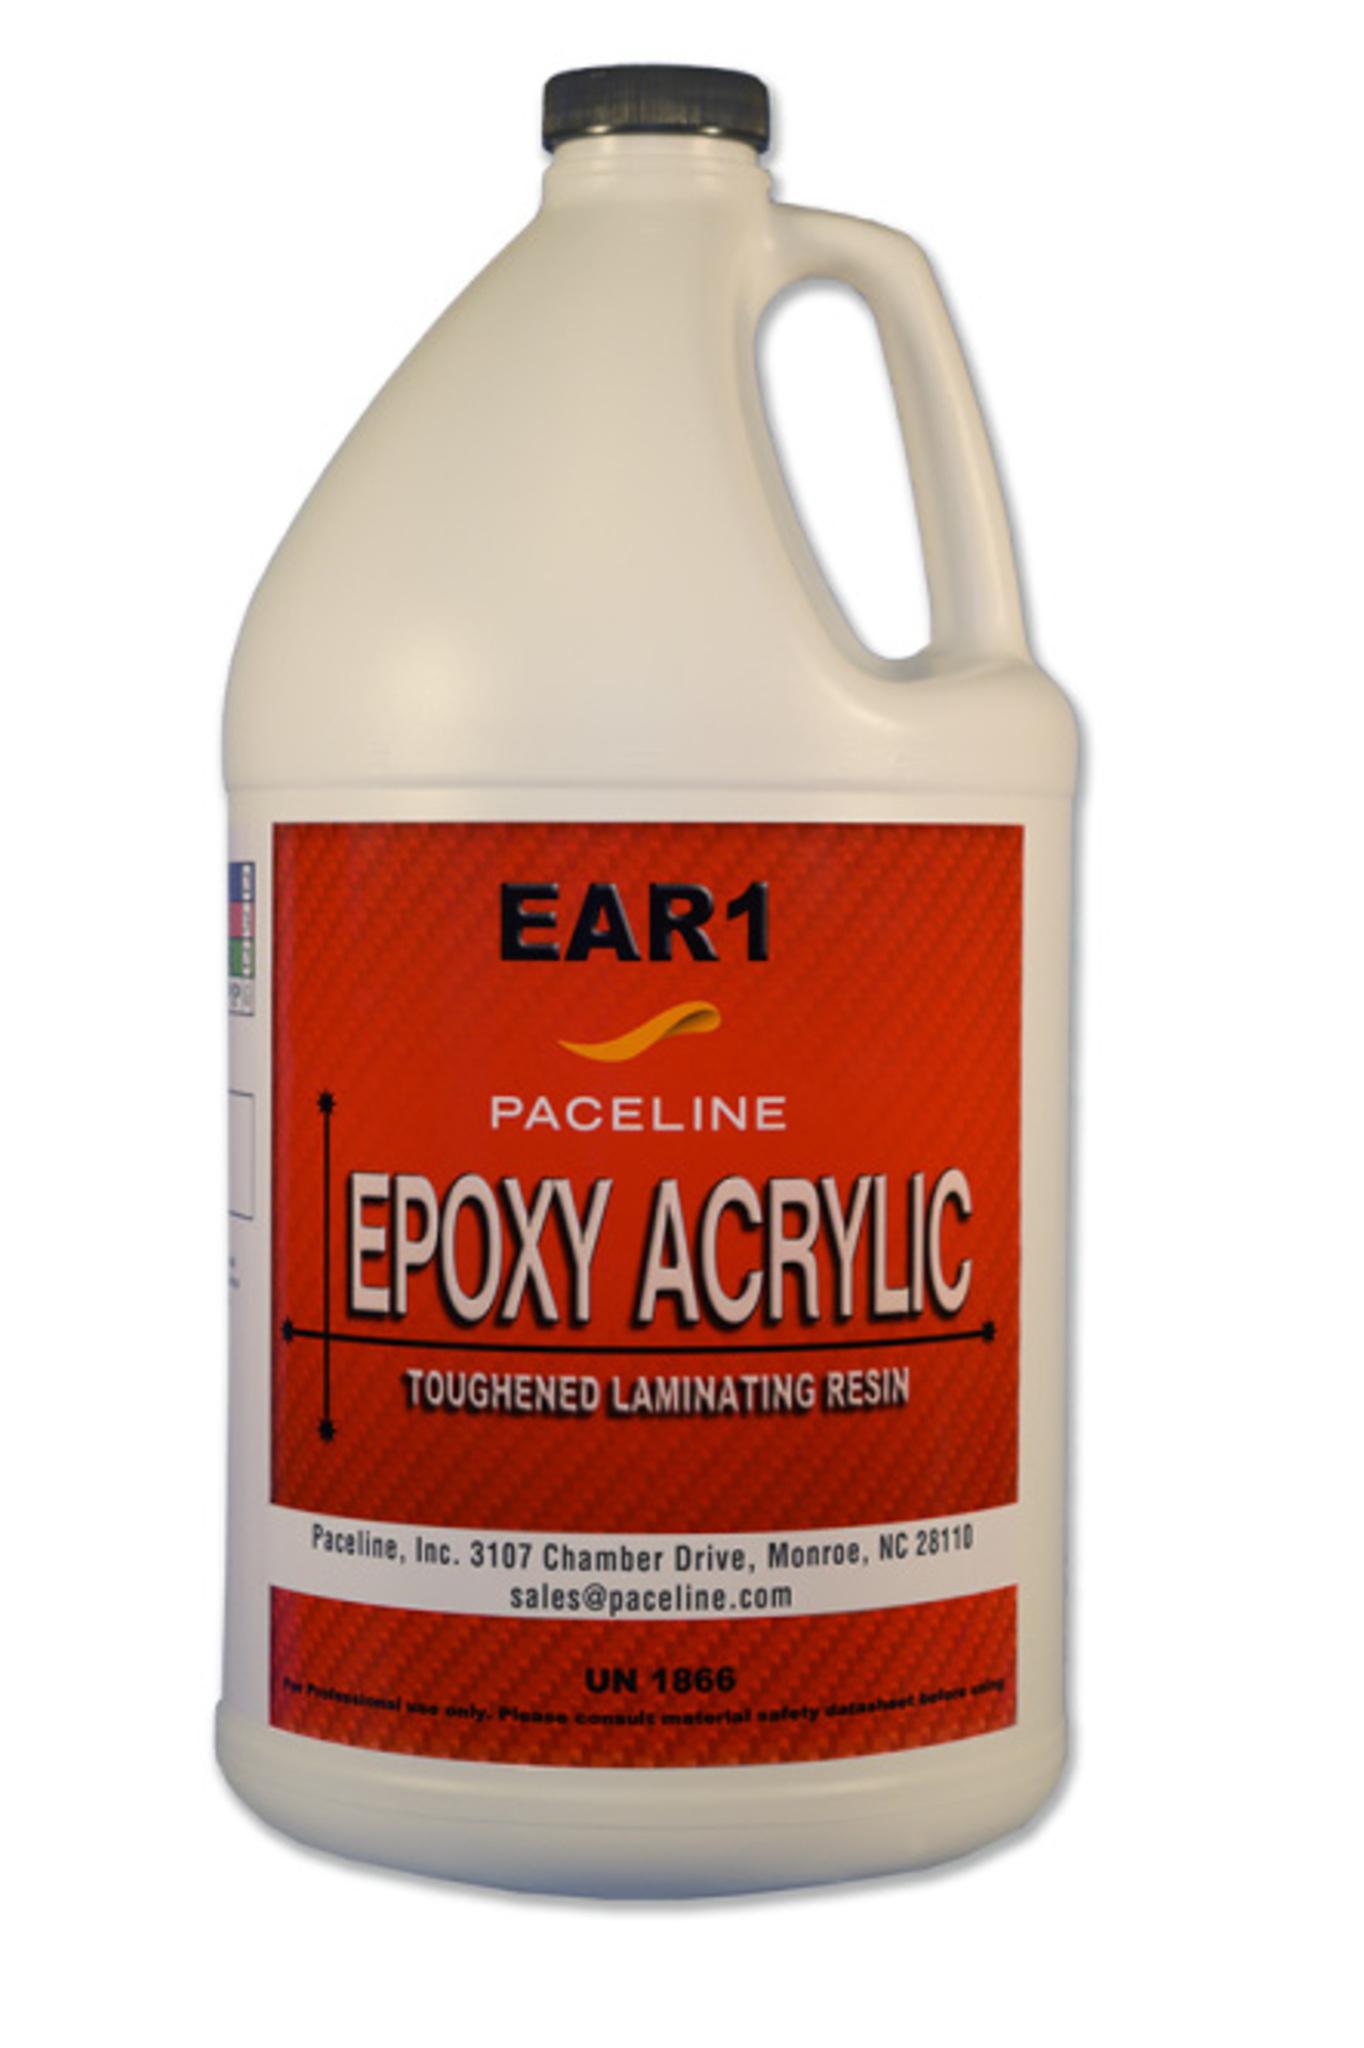 EAR1 Epoxy Acrylic Resin